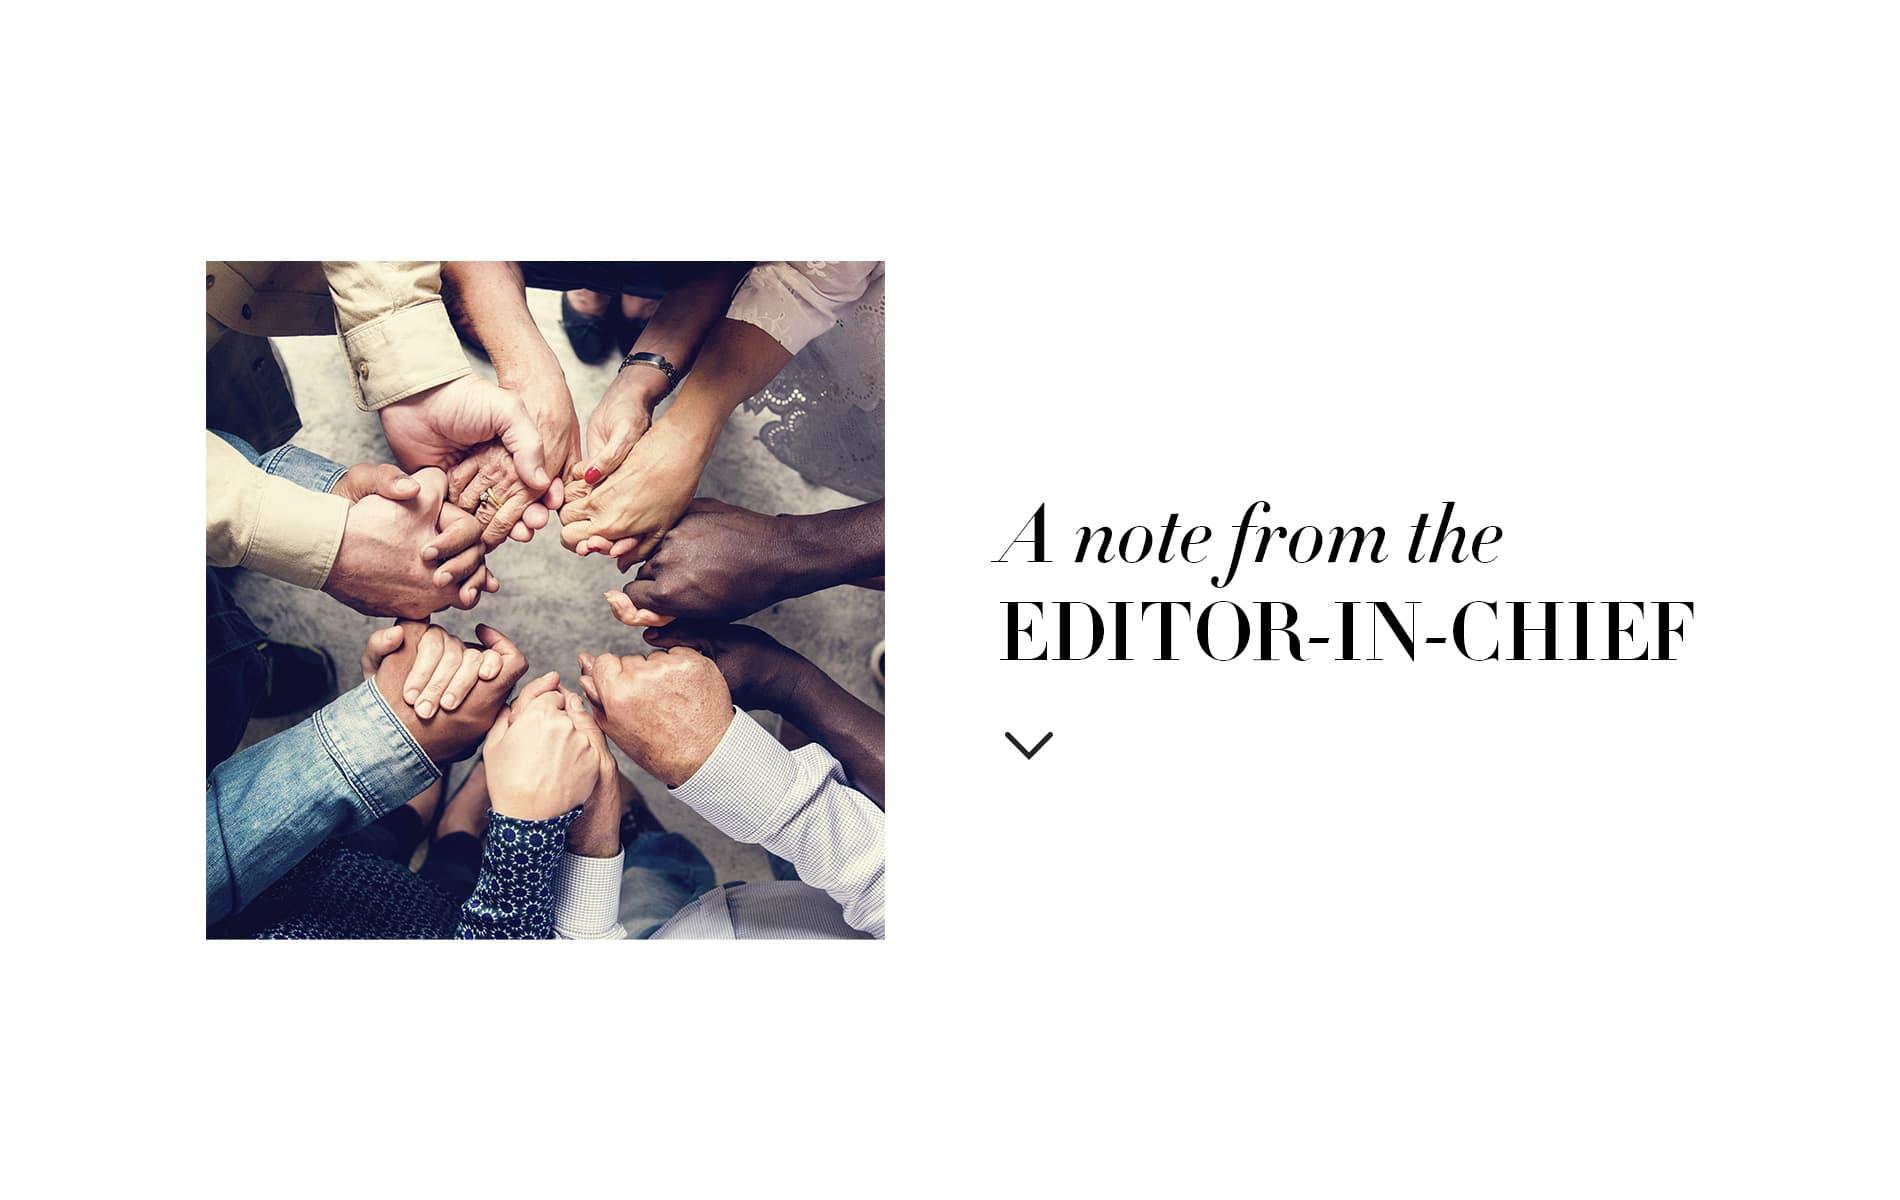 VIE Magazine, Lisa Burwell, Editor-in-Chief, Editor-in-Chief Note